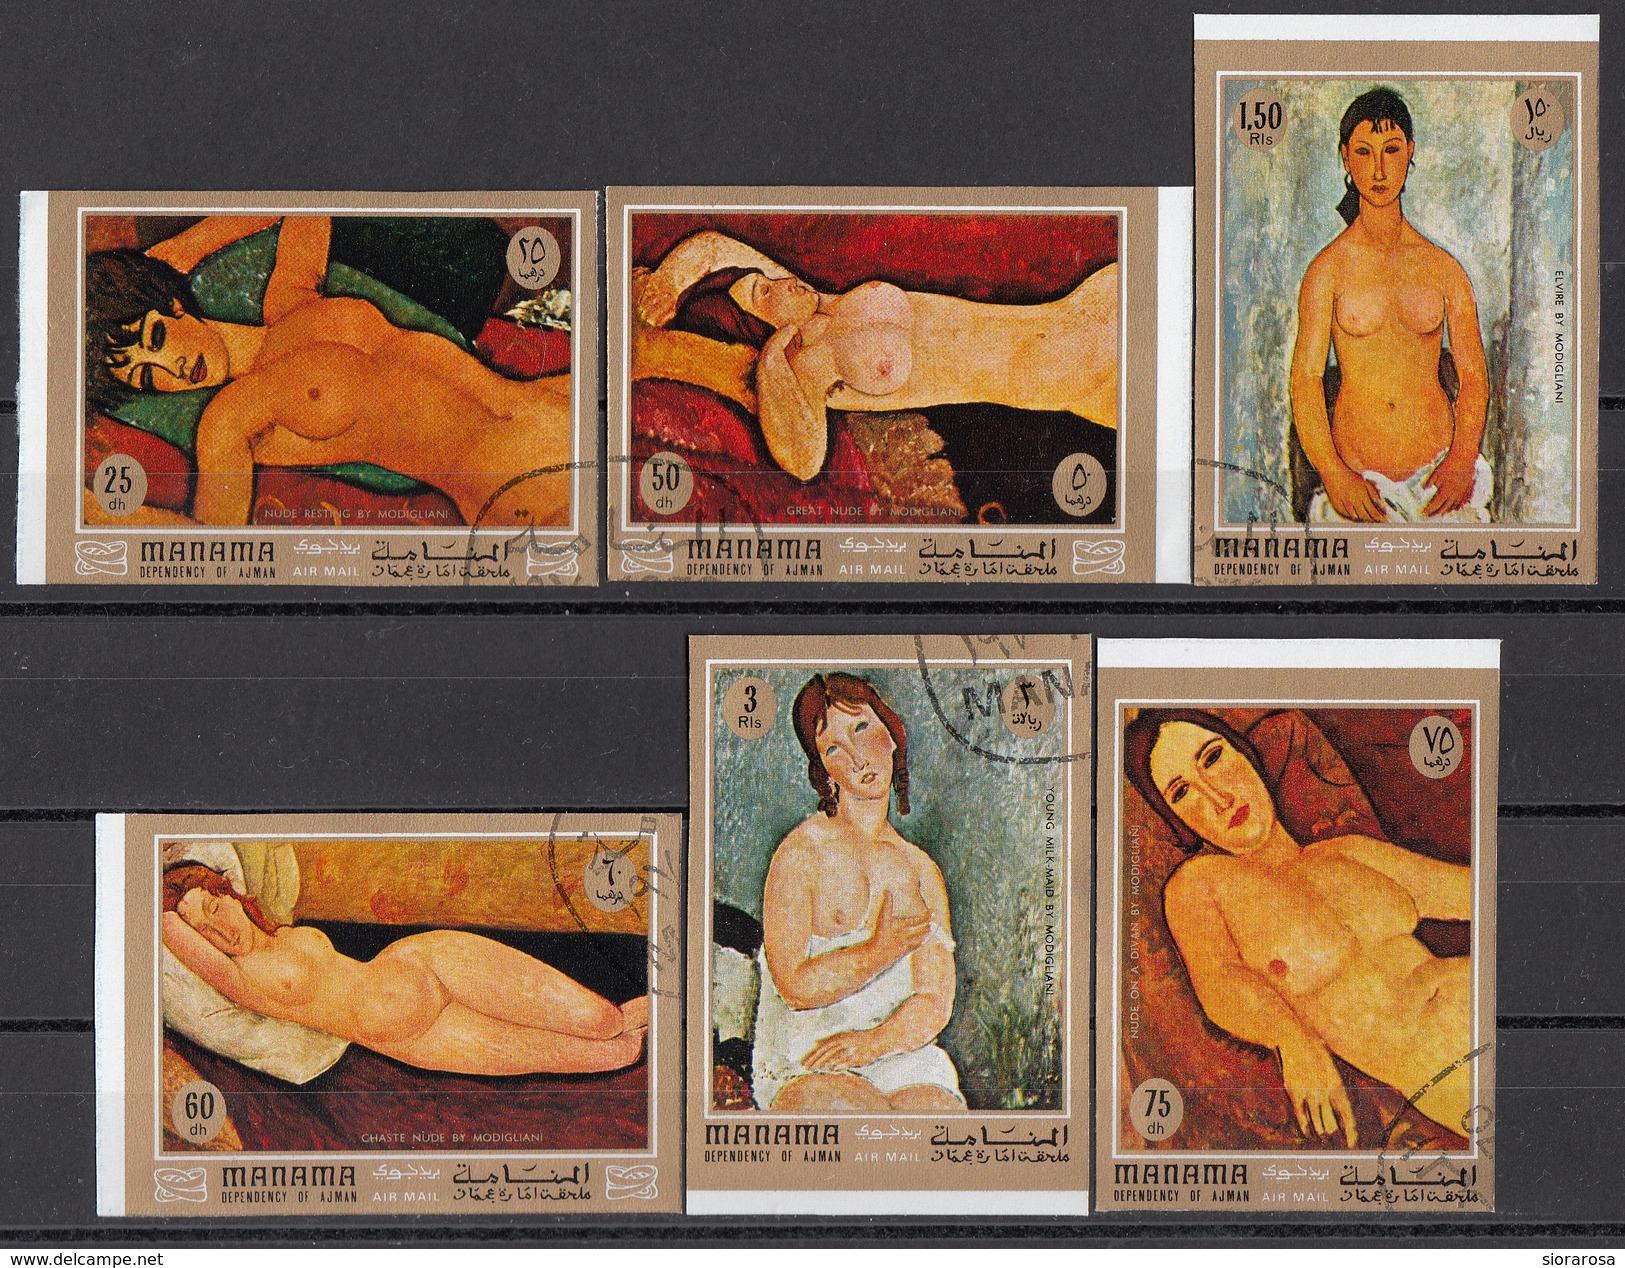 425 Manama 1971 Quadri Dipinti Da A. Modigliani Full Set Non Dentellato Paintings Tableaux - Nudes